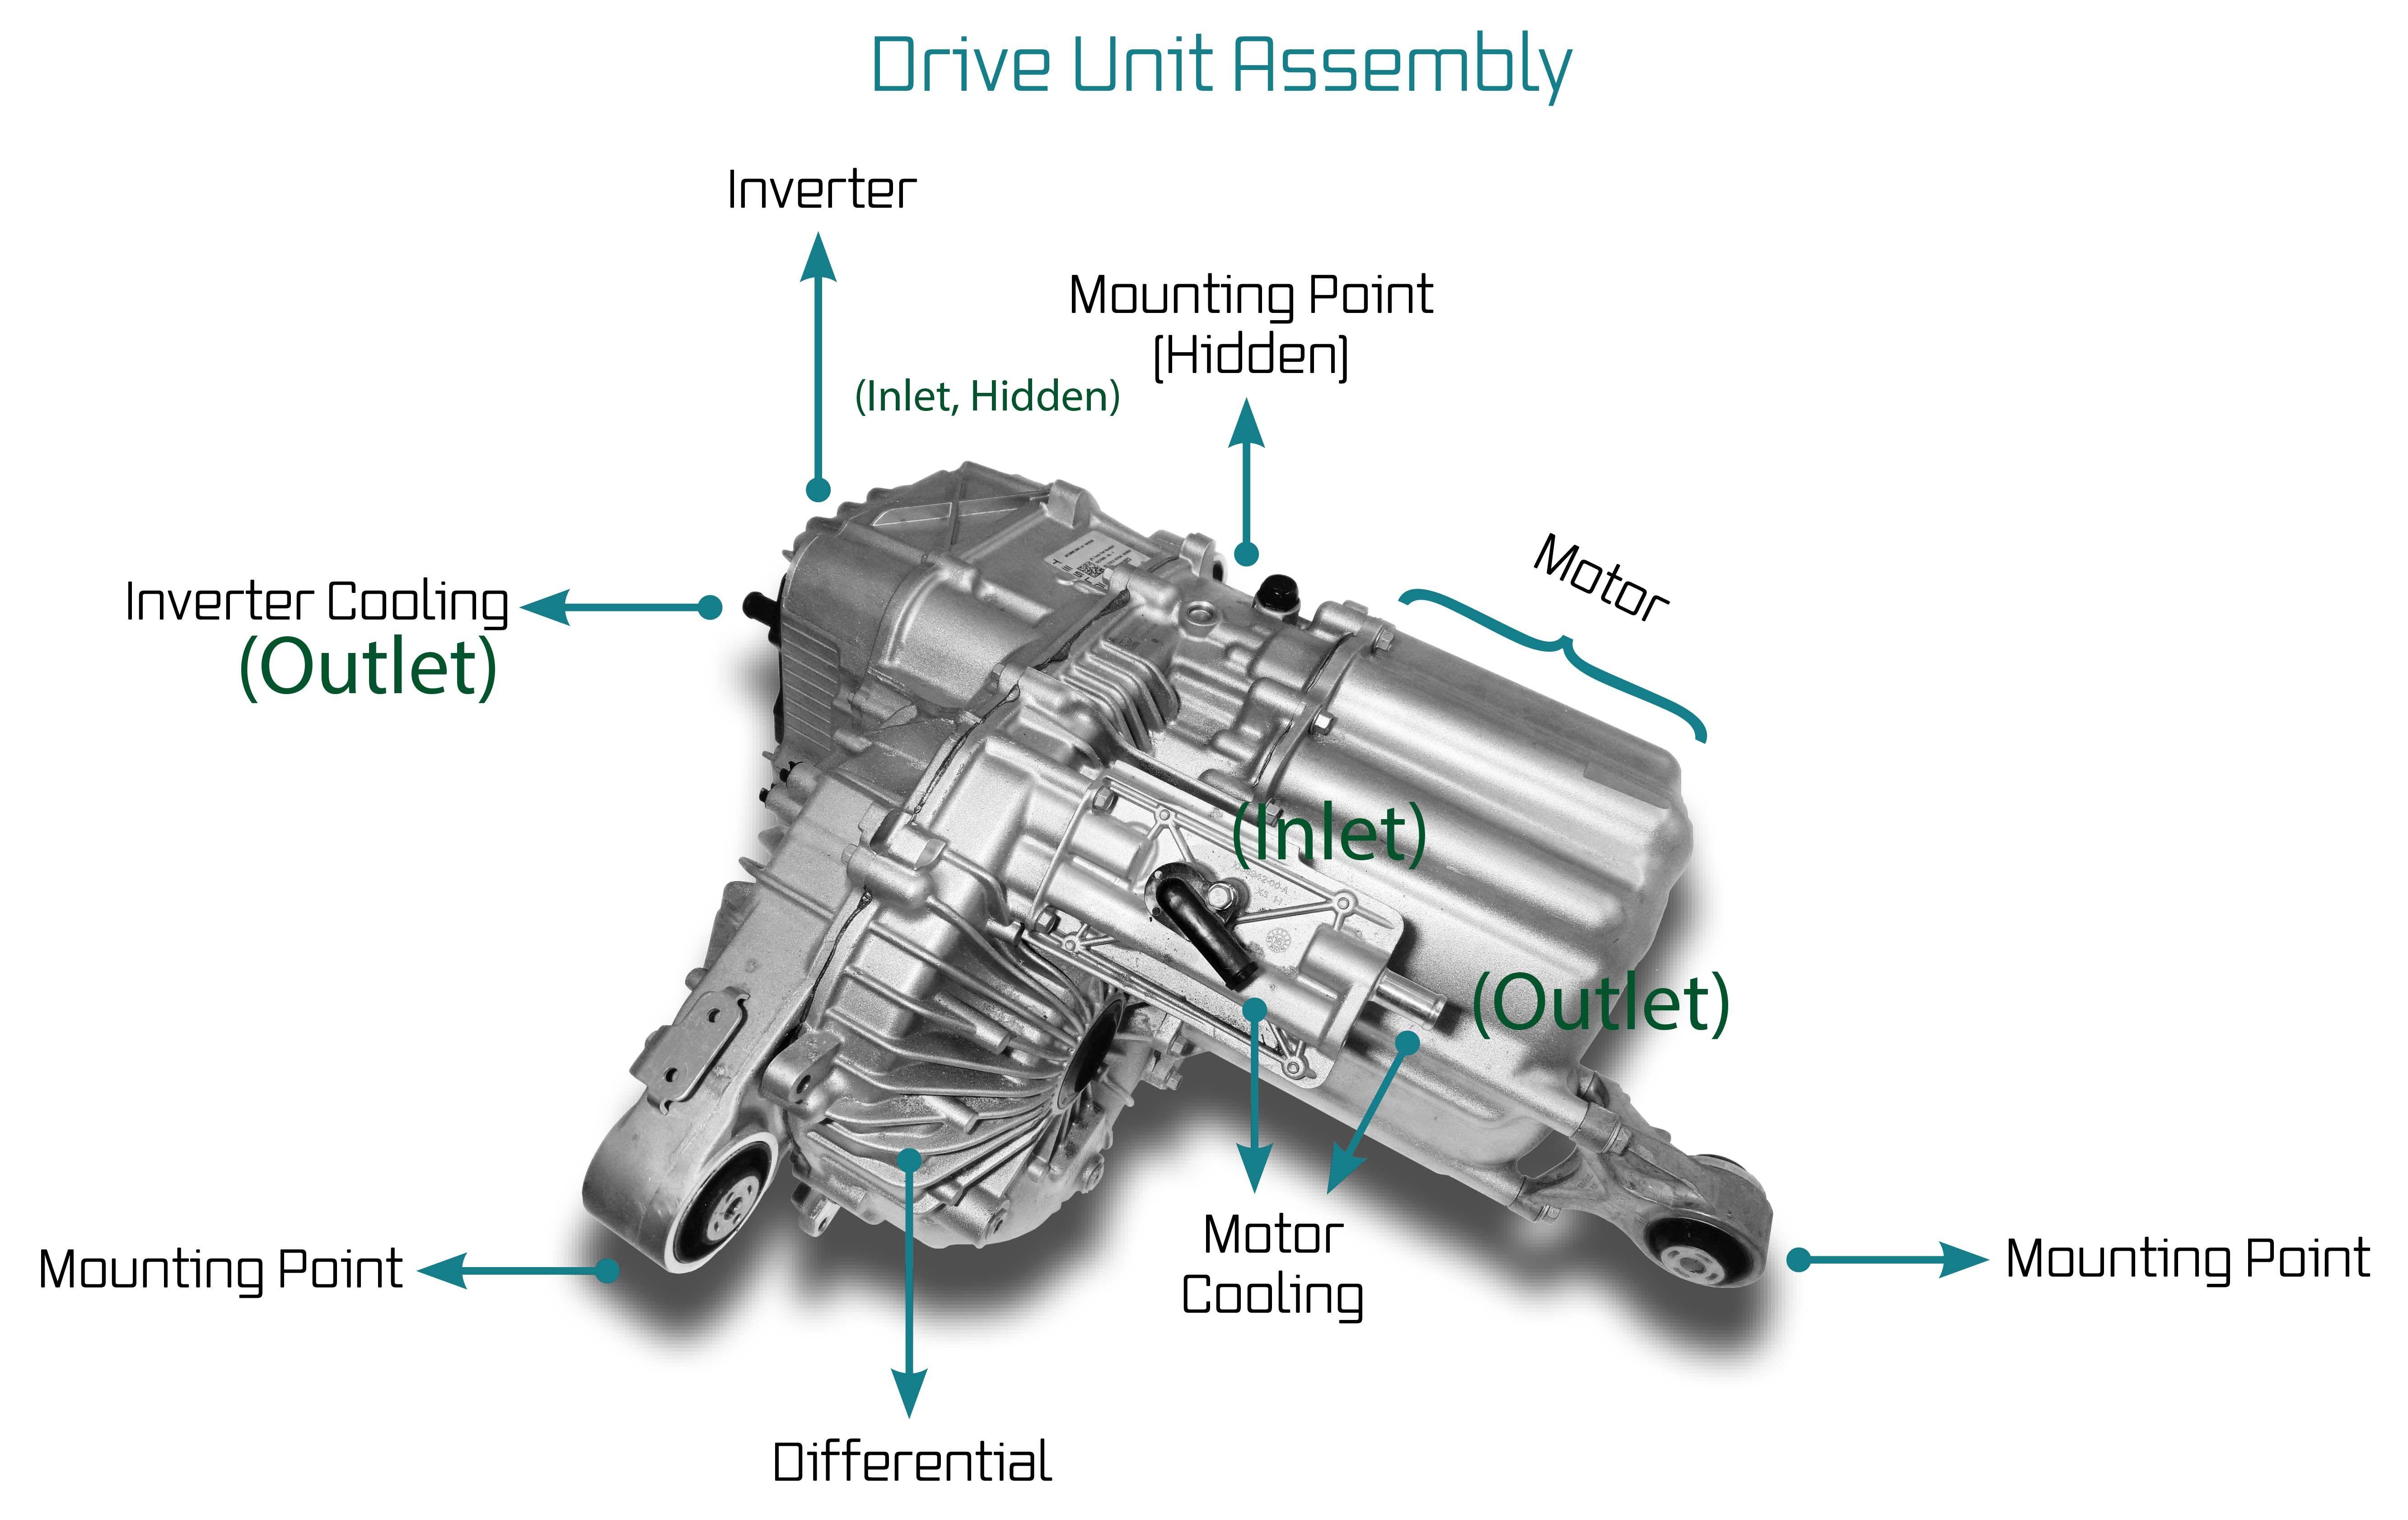 Tesla Rear Drive Unit Labeled Delorean, The unit, Tesla